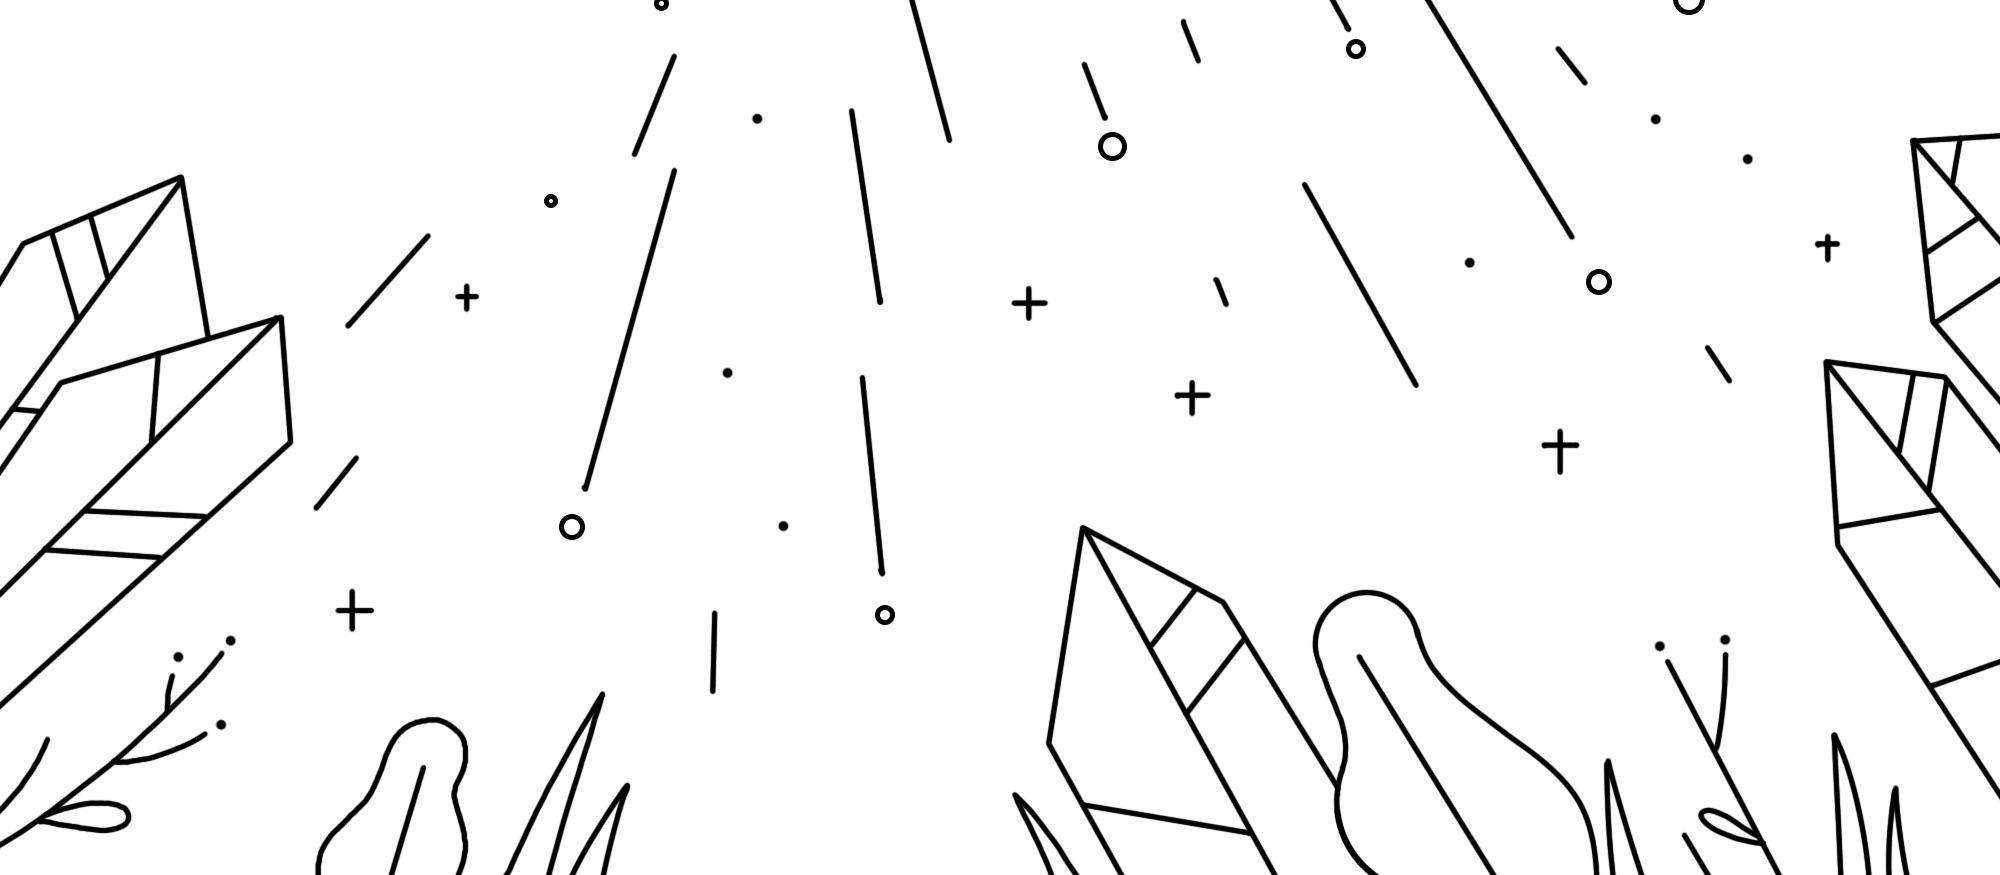 Geminids_MP_sketches_v4.png